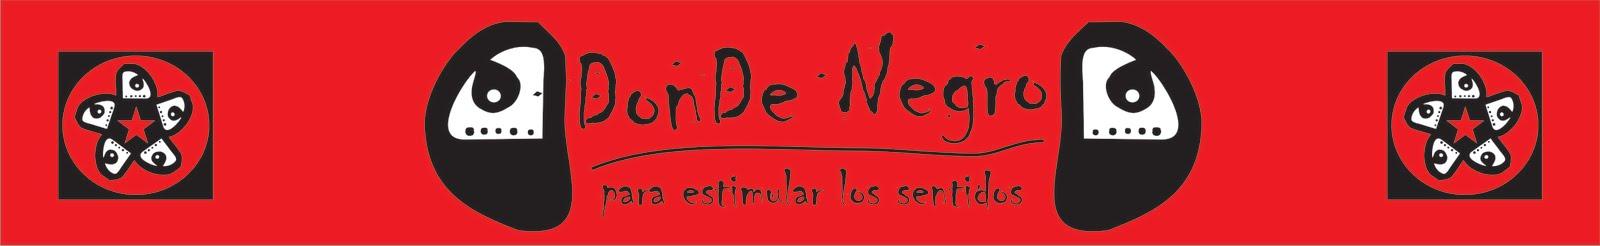 Don De Negro